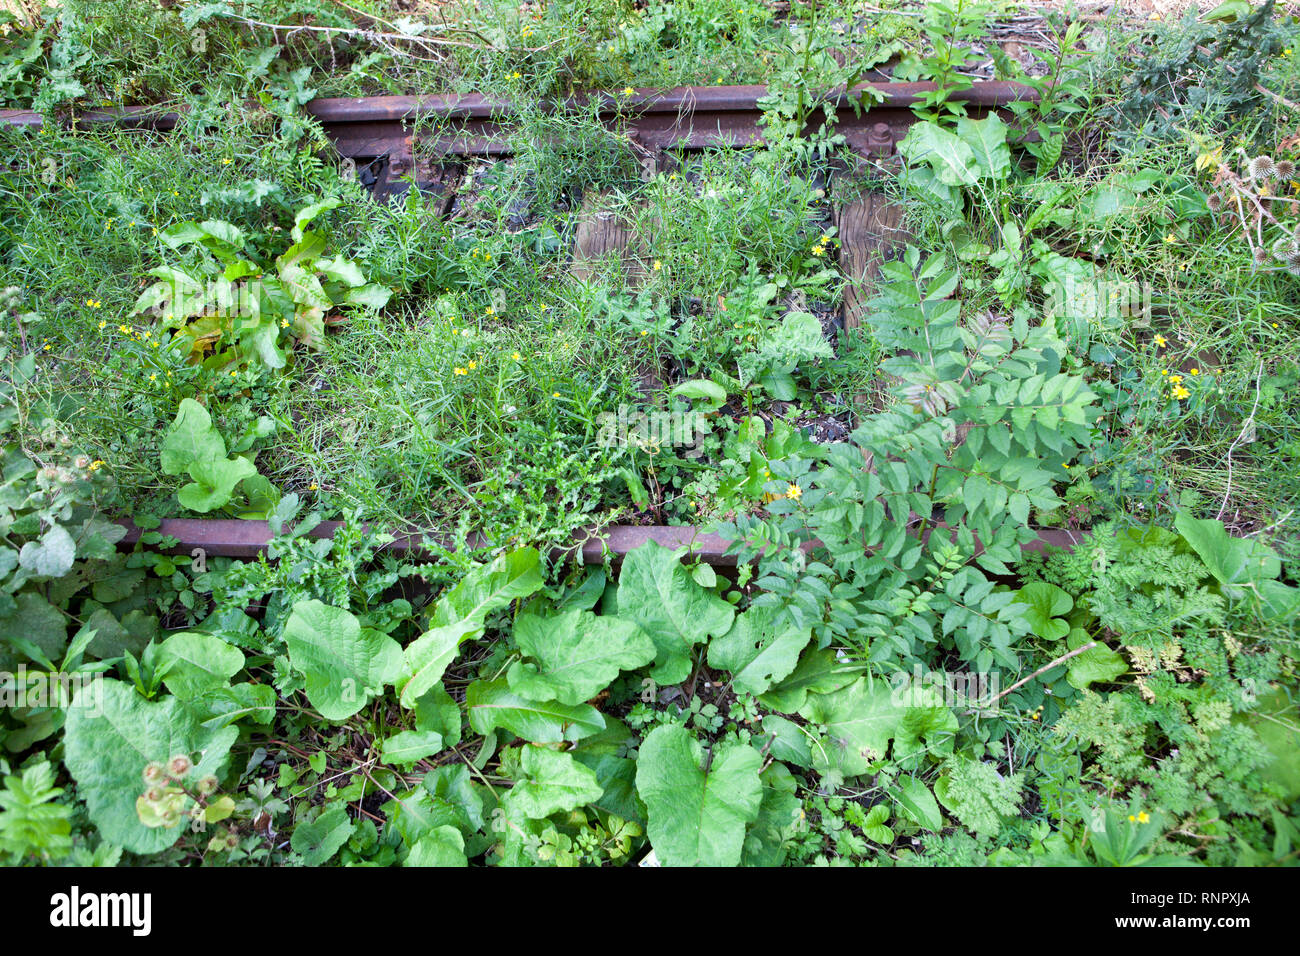 Overgrown railway tracks - Stock Image